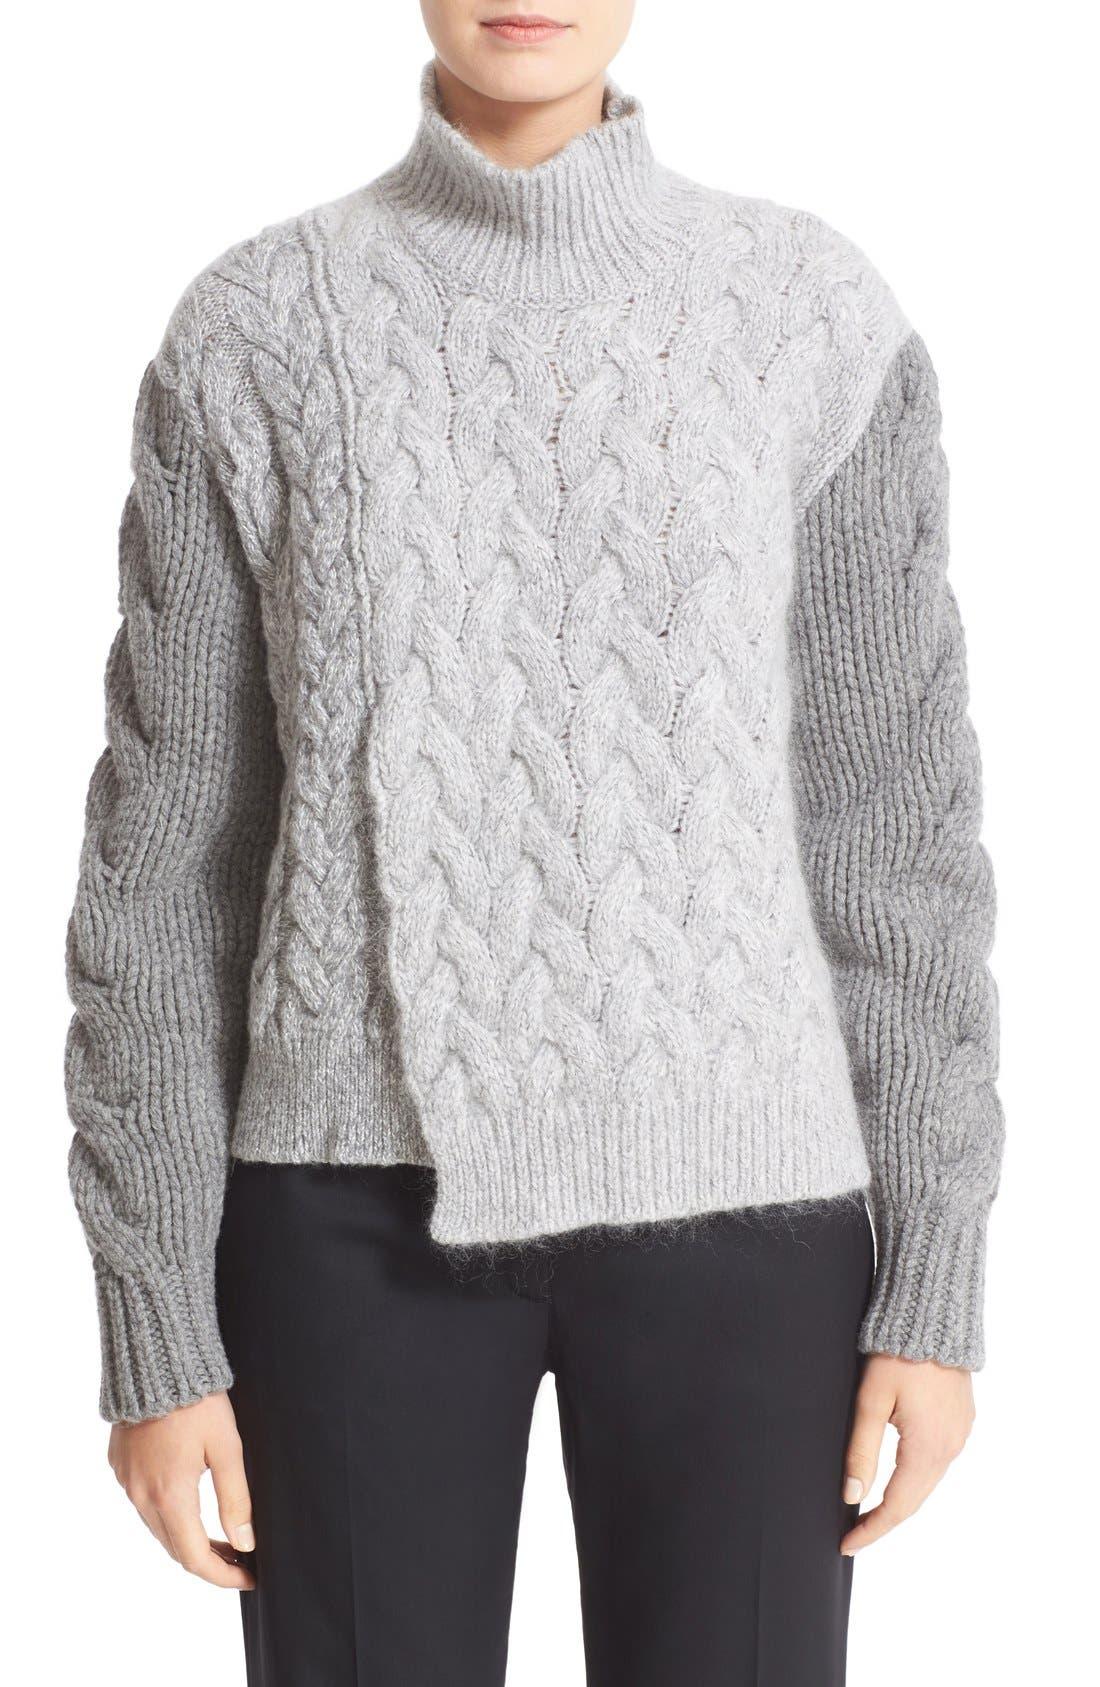 STELLA MCCARTNEY, Mixed Media Turtleneck Sweater, Main thumbnail 1, color, 120